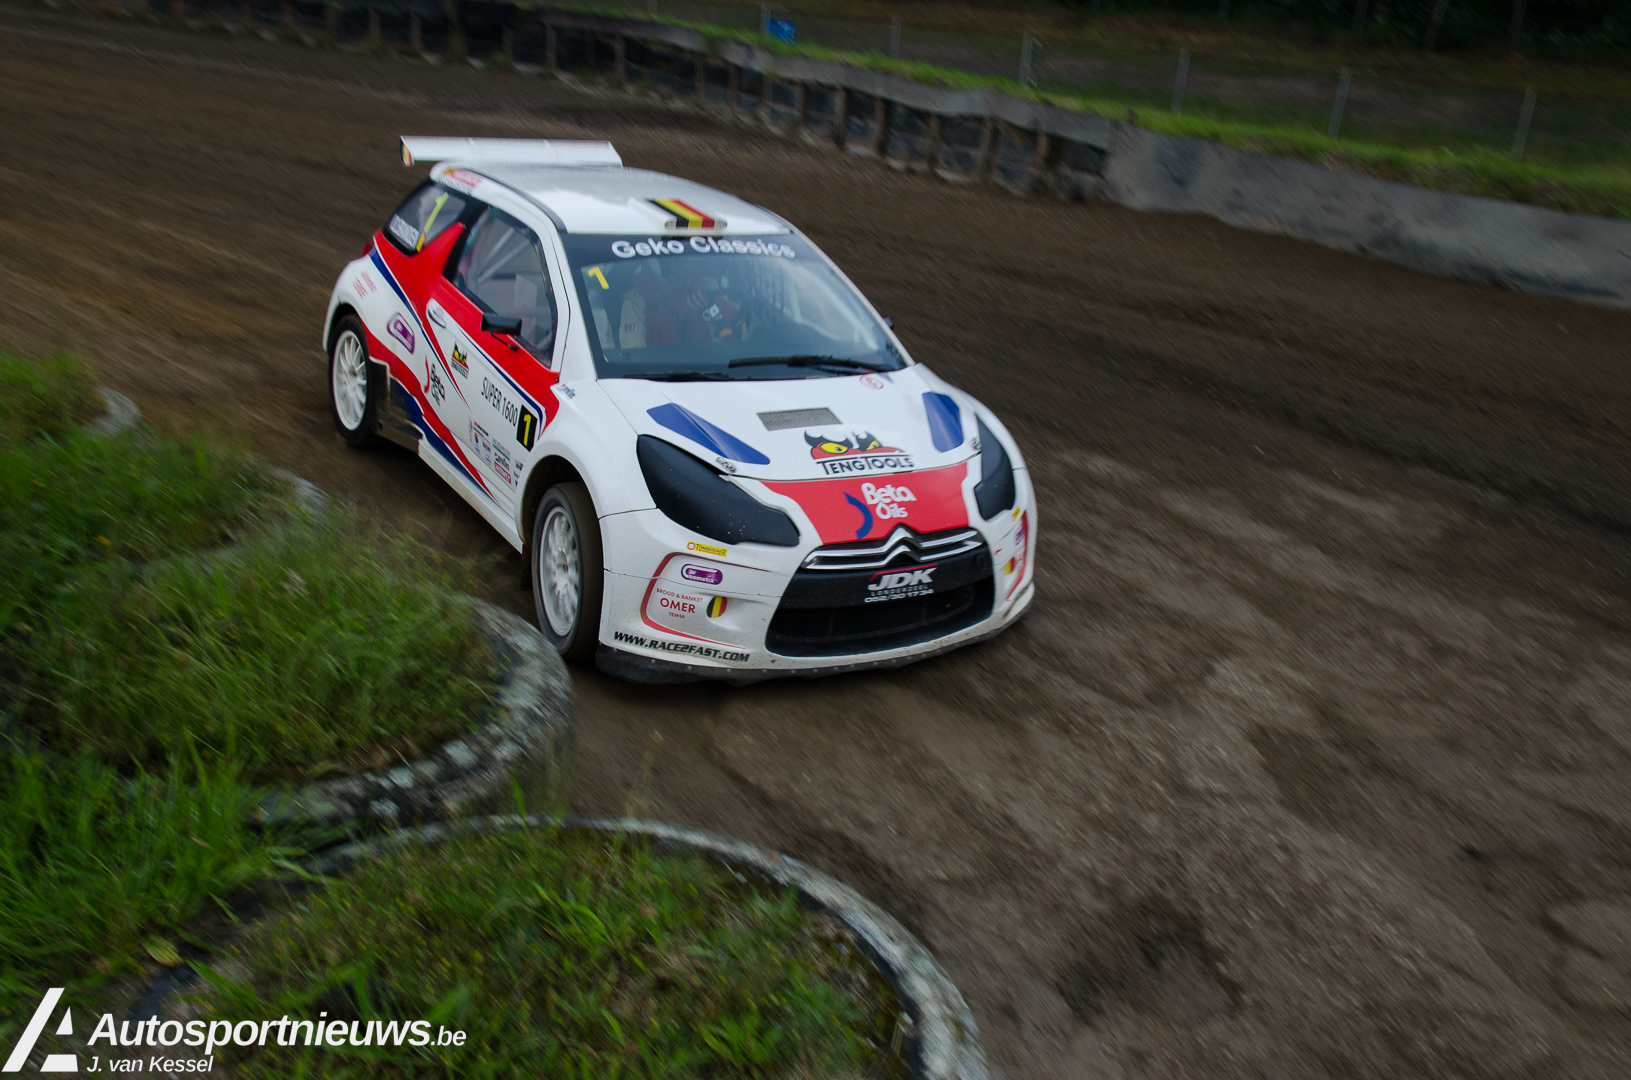 4e wedstrijd NK Rallycross